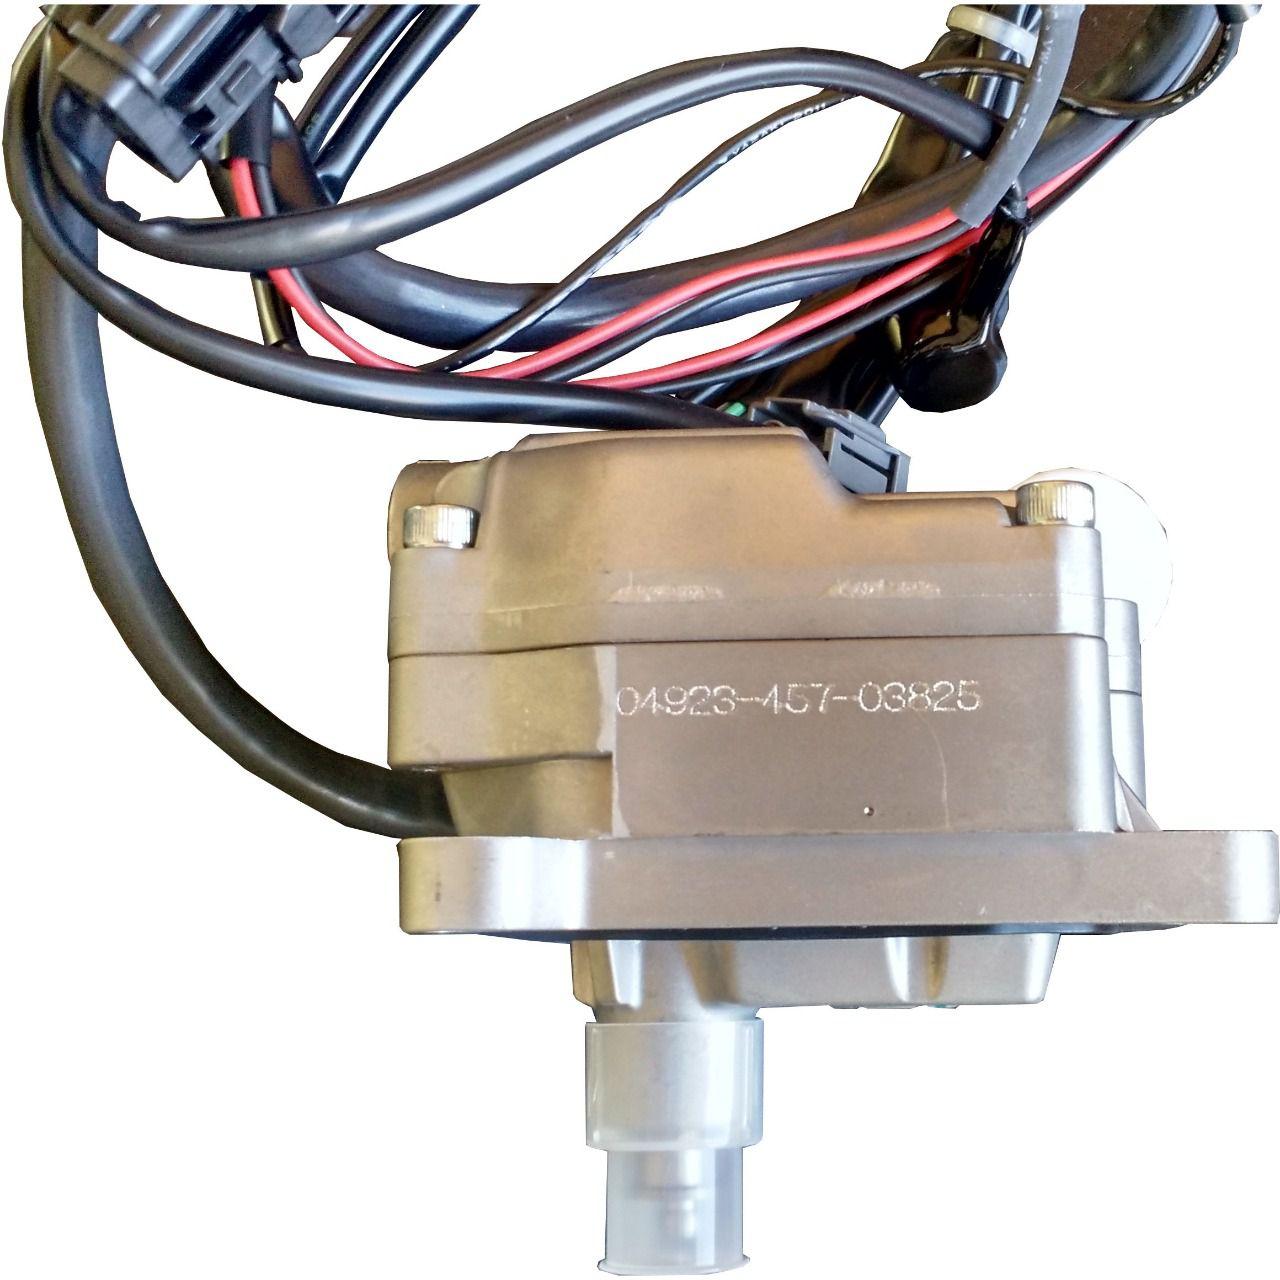 Gerenciador Eletrônico Kia Bongo K2500 TCI 2.5 8v Ano  2005 a 2011 Euro 3